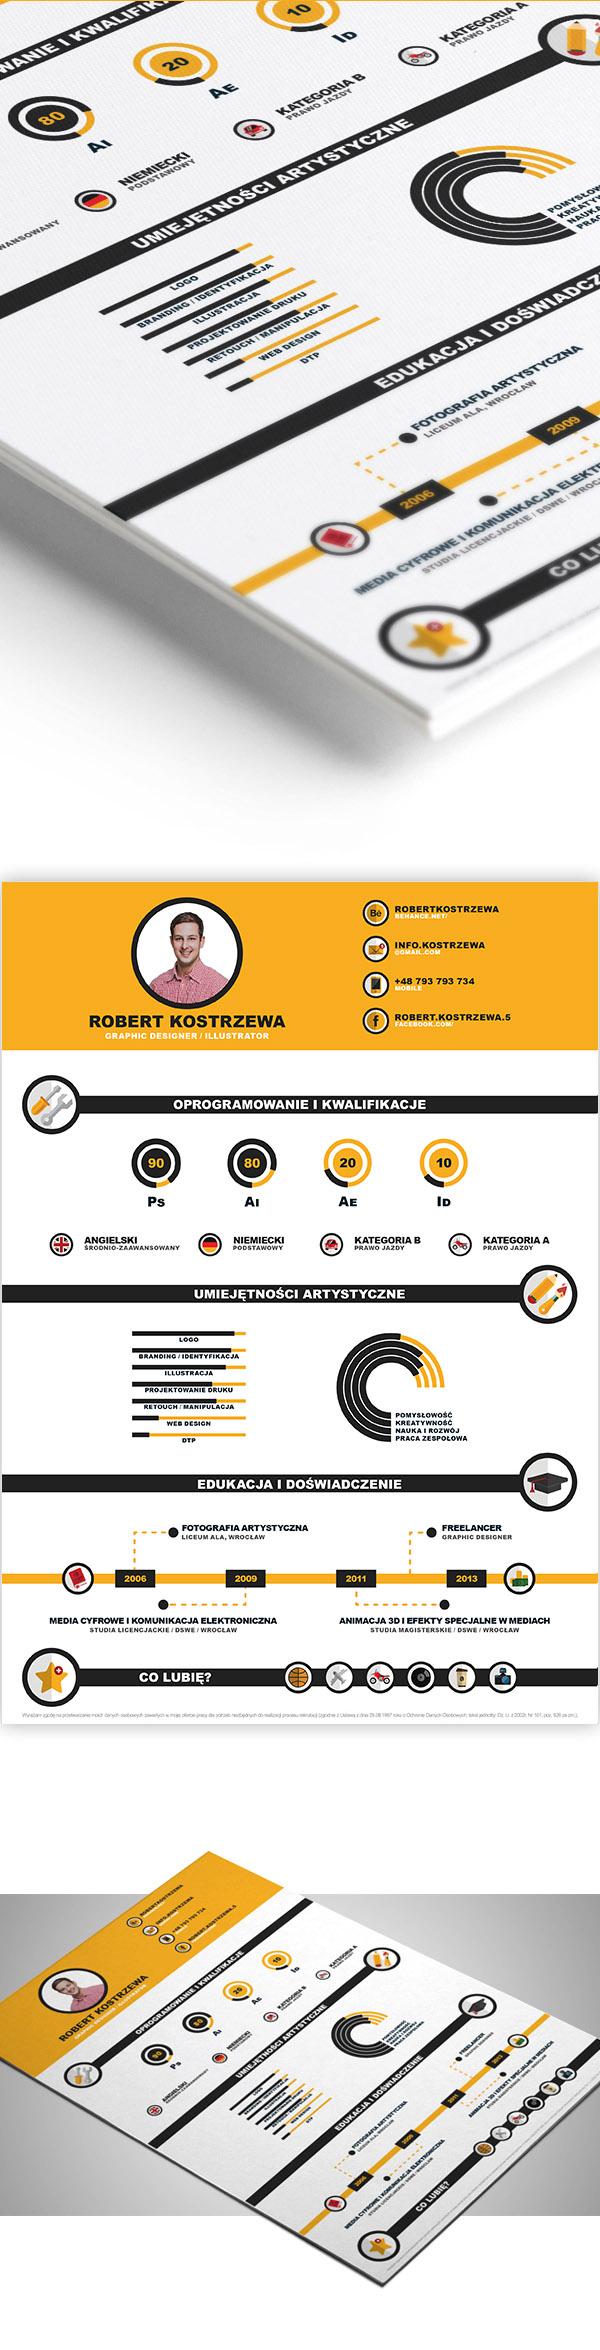 01 Infographic Cv:Resume